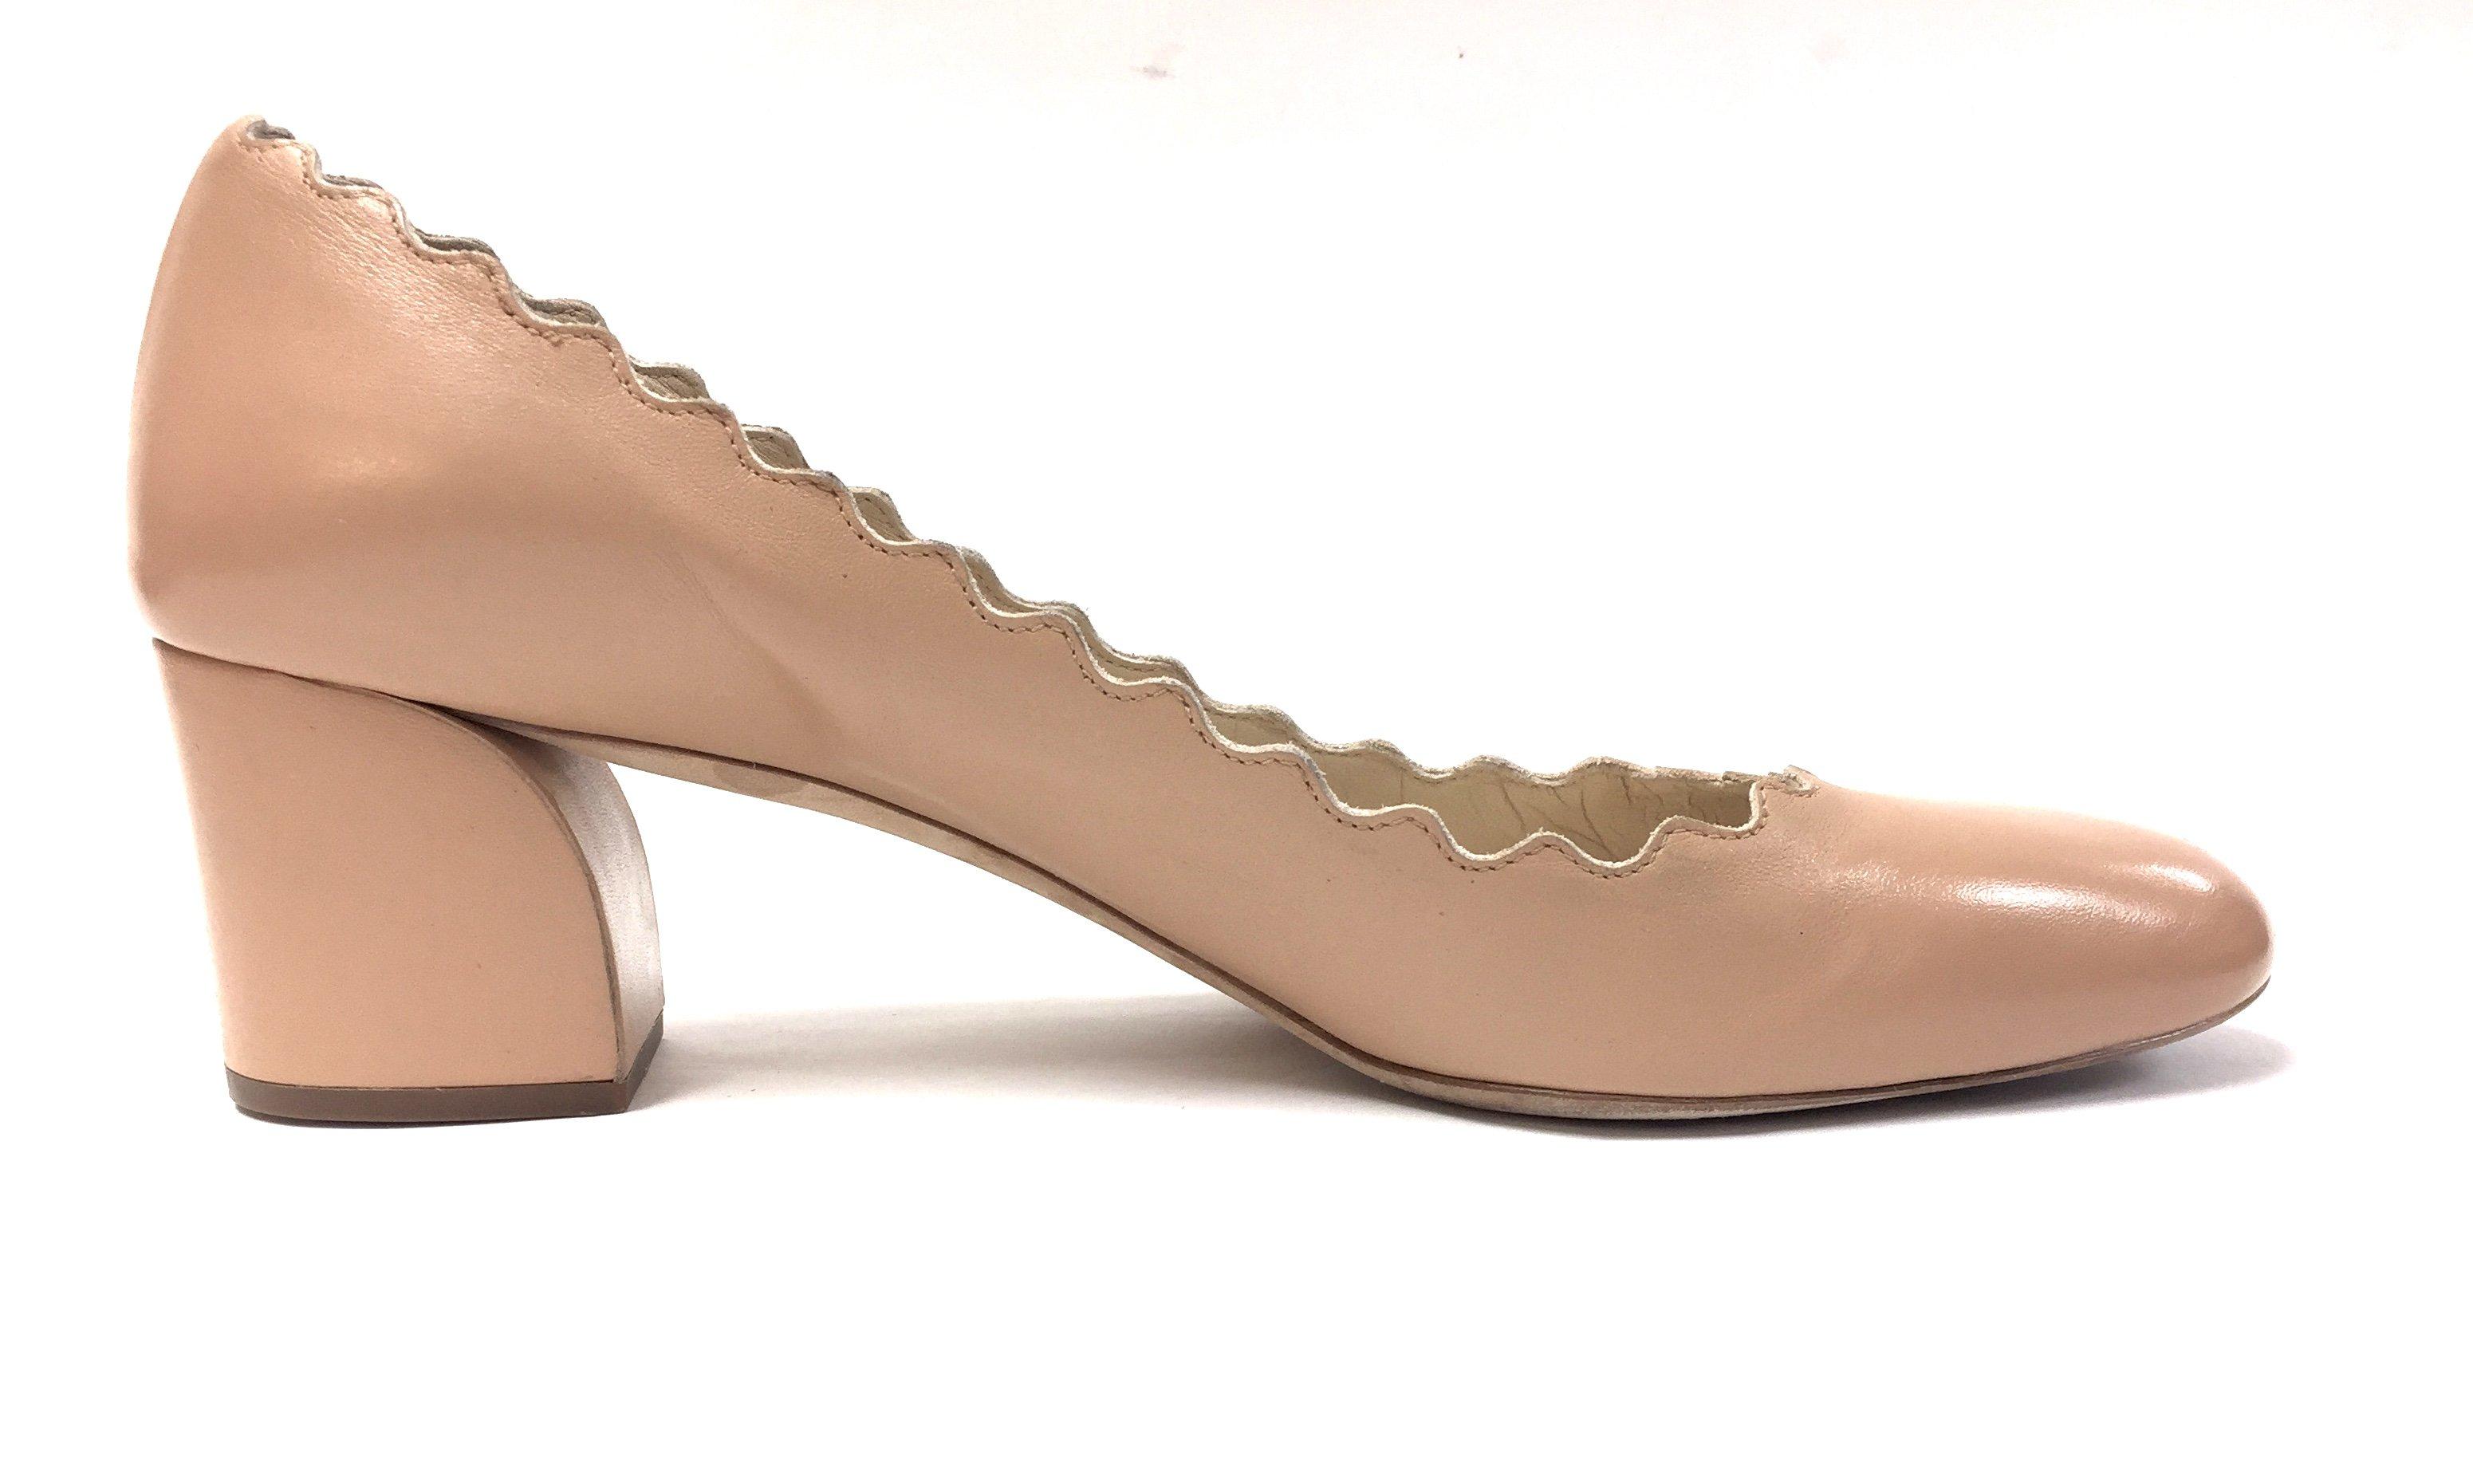 83fdbcd2735 CHLOE - LAUREN Beige Leather Scalloped-Edge Low-Heel Pumps Shoes ...